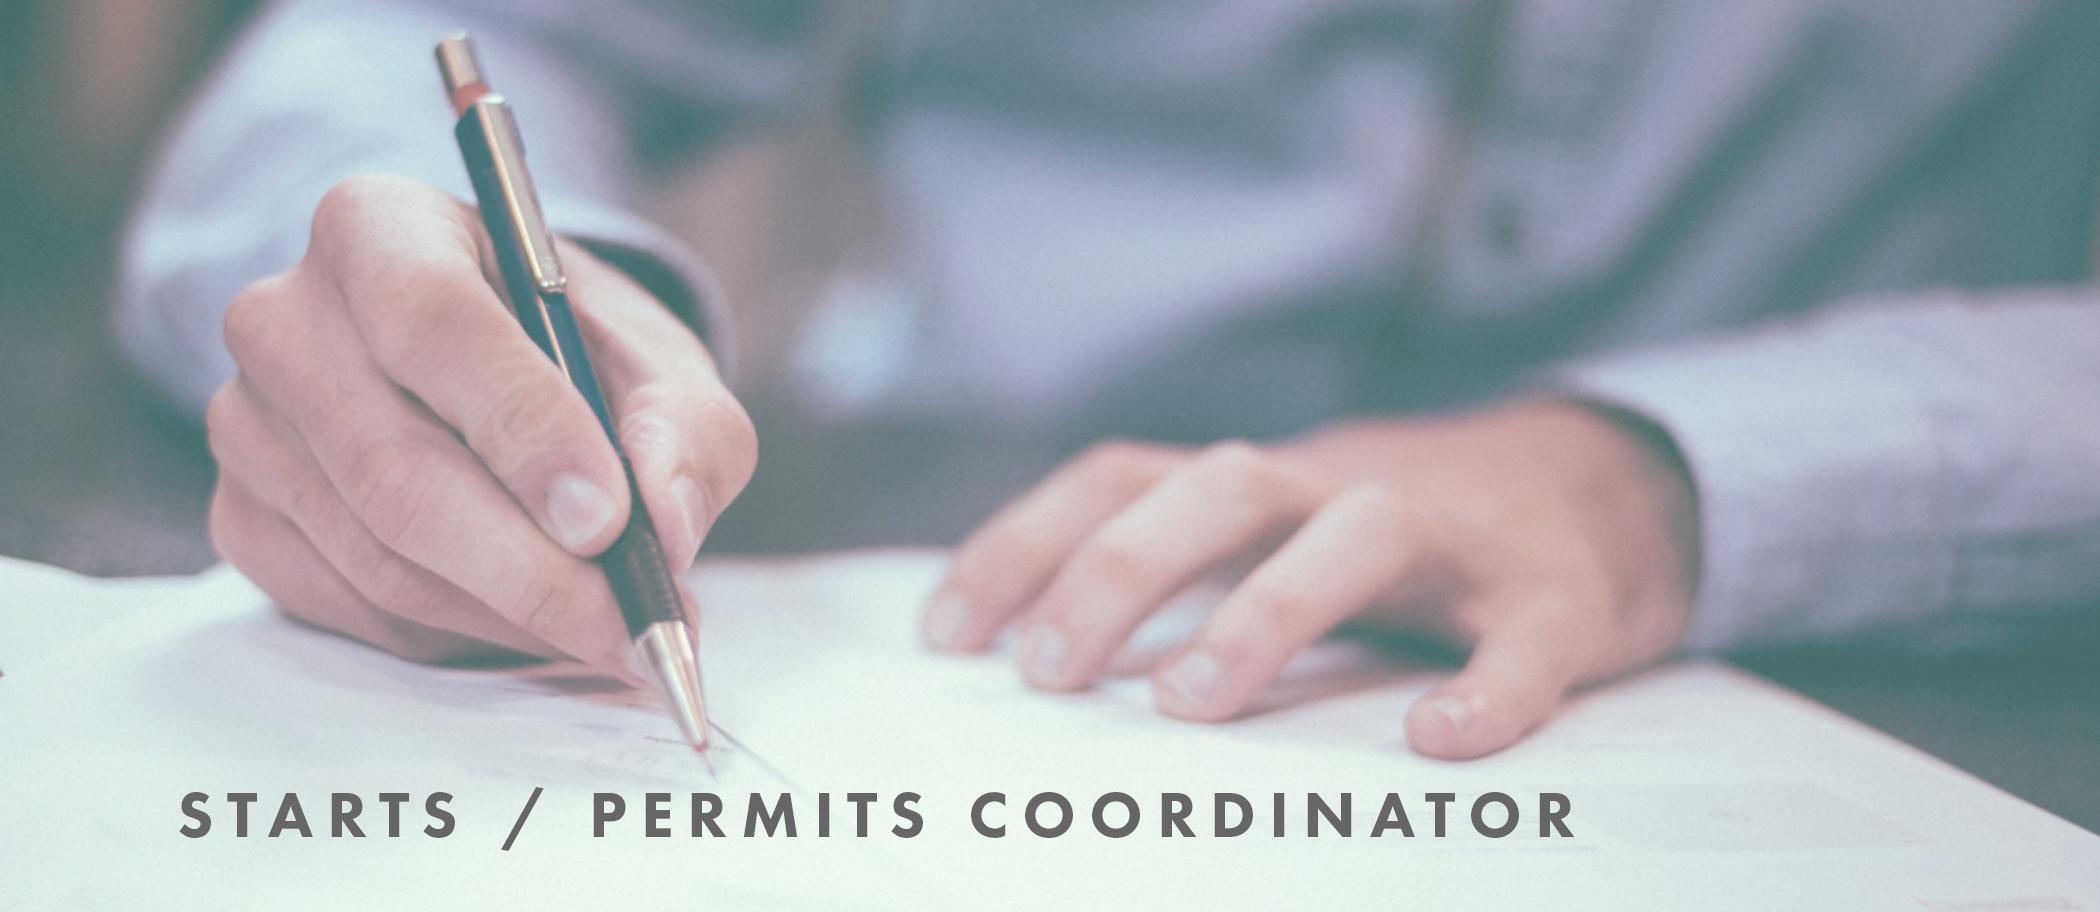 Permits Coordinator.jpg